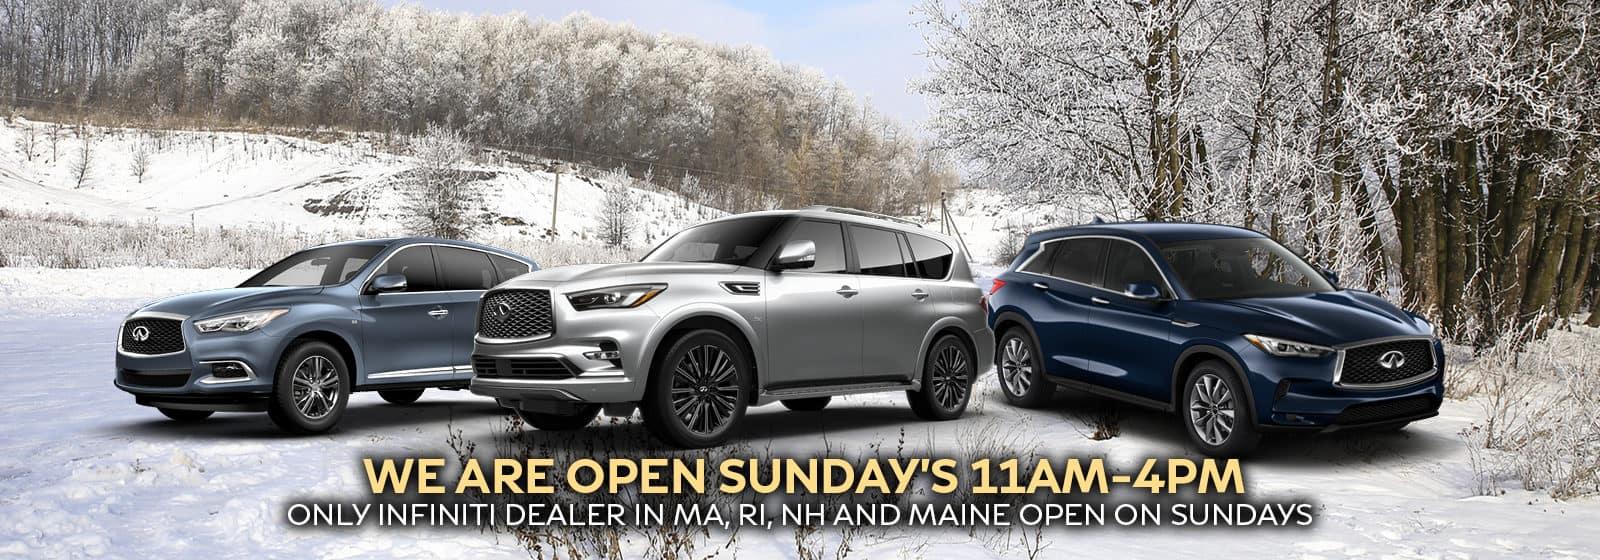 Open Sundays 11AM - 4PM